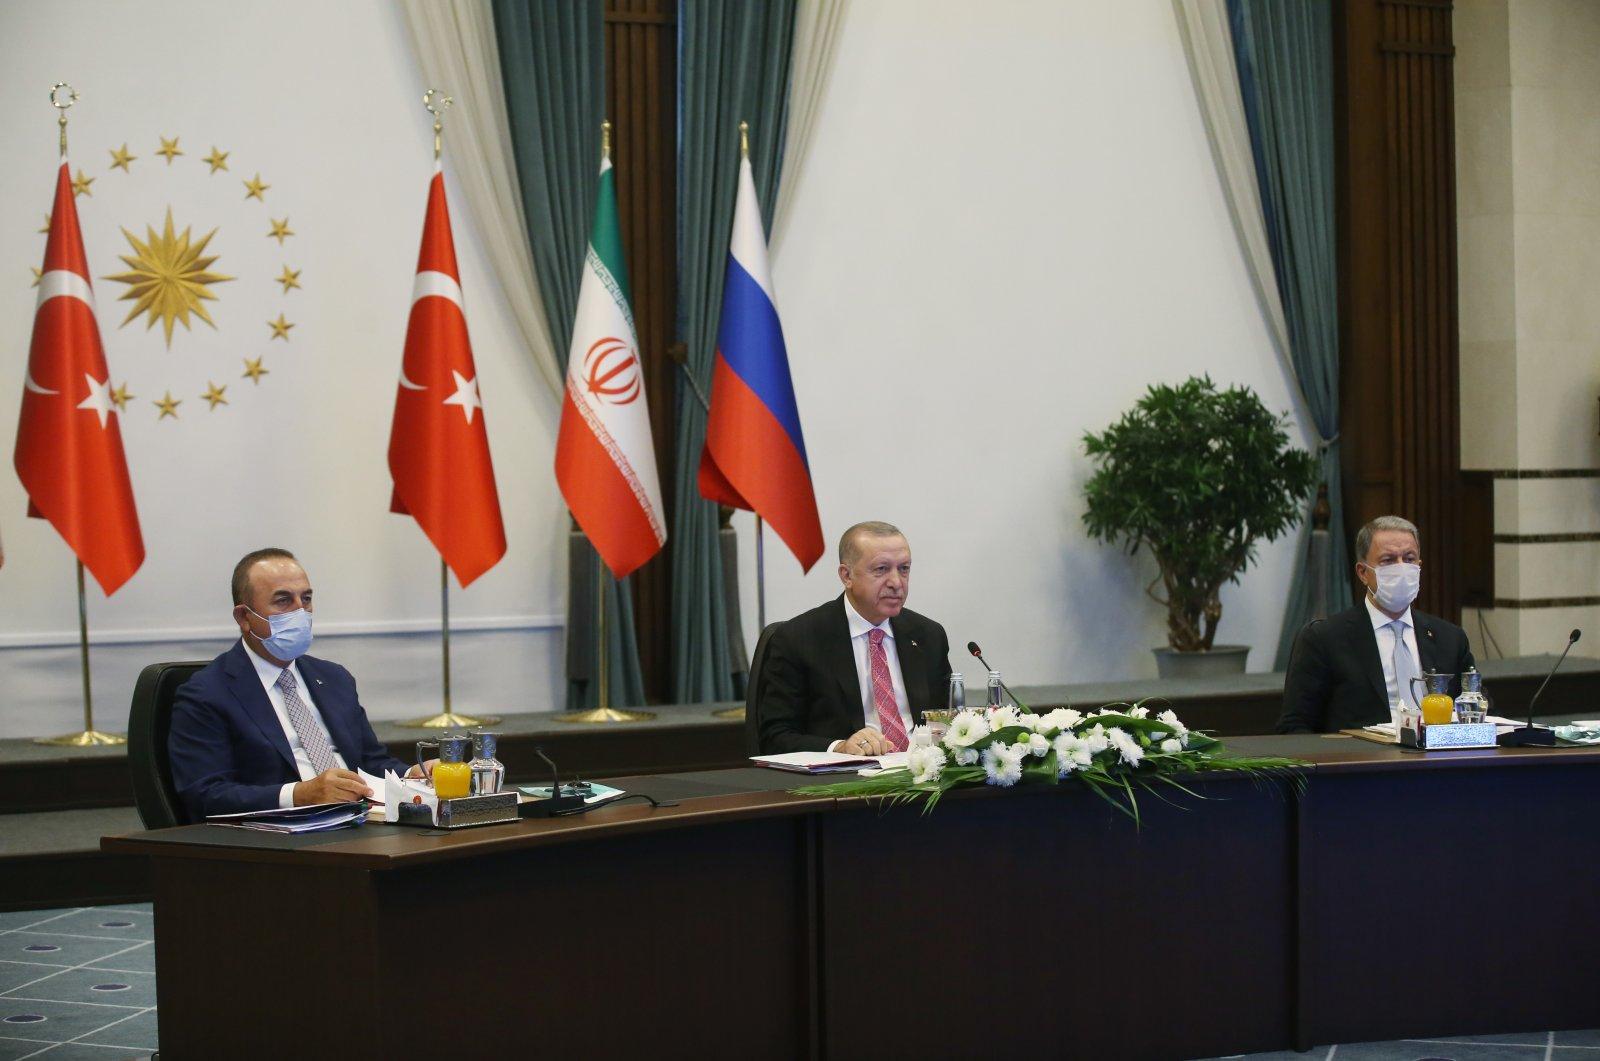 Turkish Foreign Minister Mevlüt Çavuşoğlu (L), President Recep Tayyip Erdoğan (C) and Defense Minister Hulusi Akar (R) during the Turkey-Russia-Iran videoconference summit under the Astana process, July 1, 2020. (AA Photo)